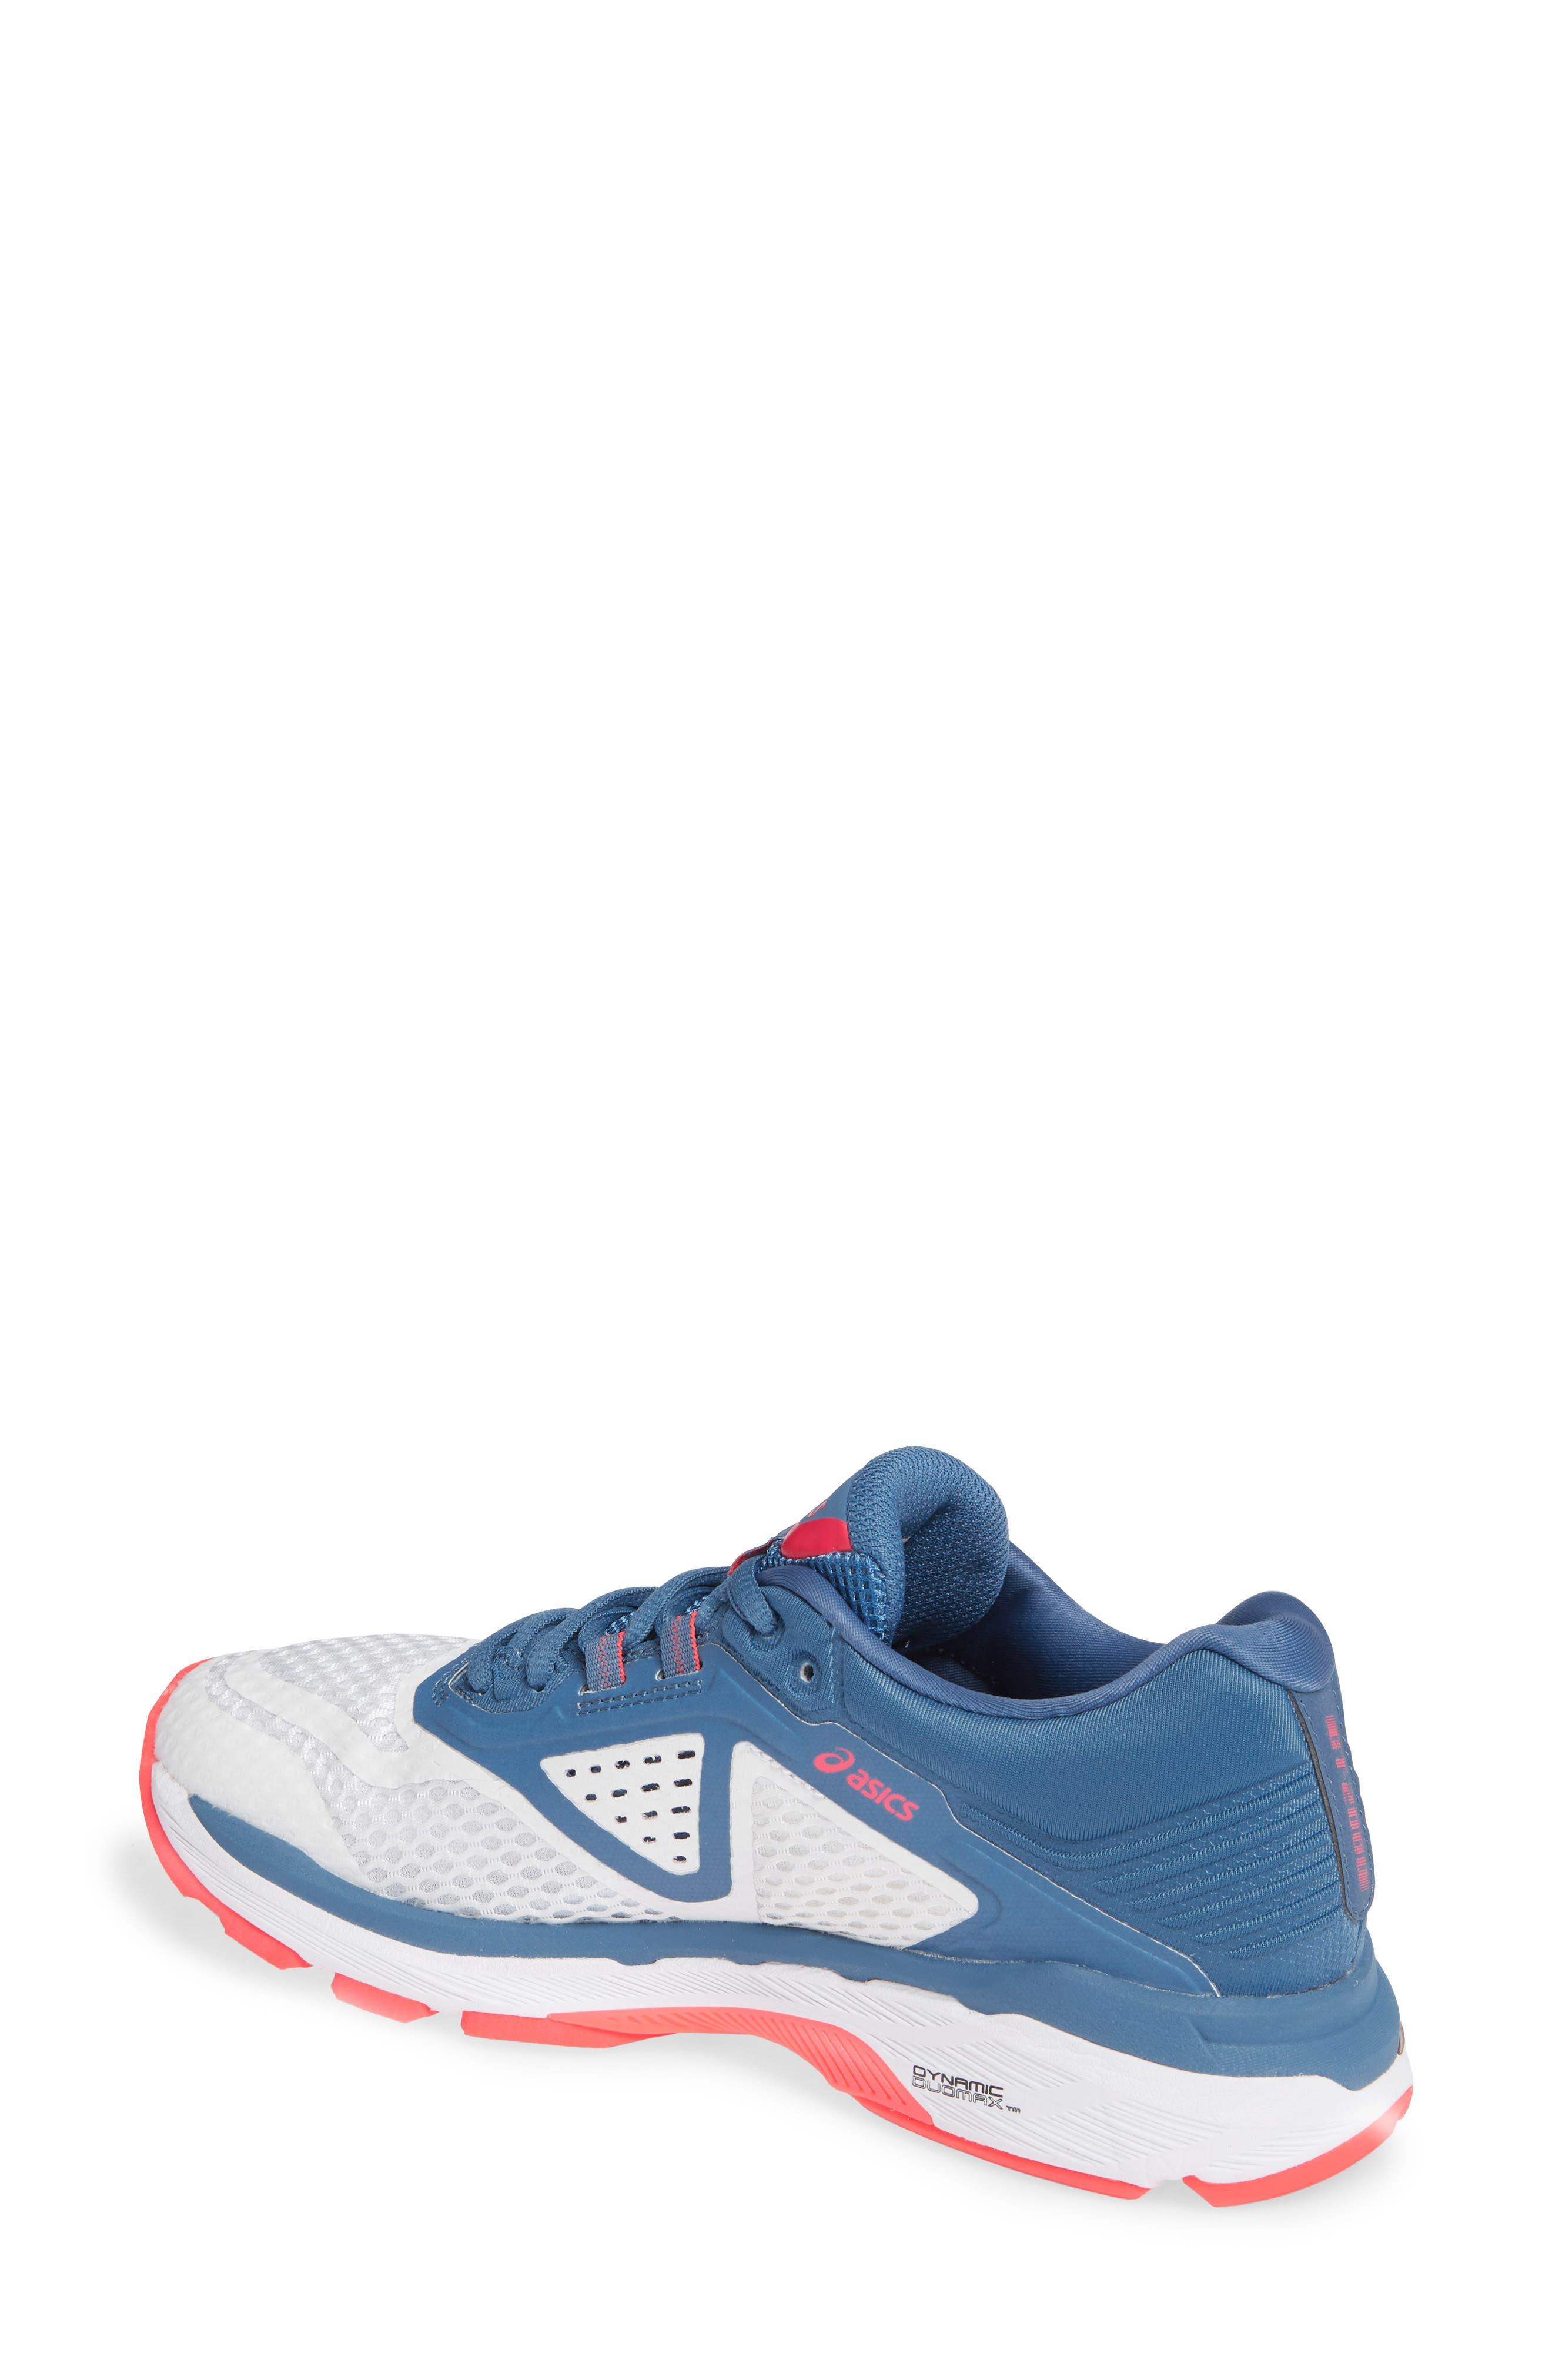 GT-2000 6 Running Shoe,                             Alternate thumbnail 2, color,                             400